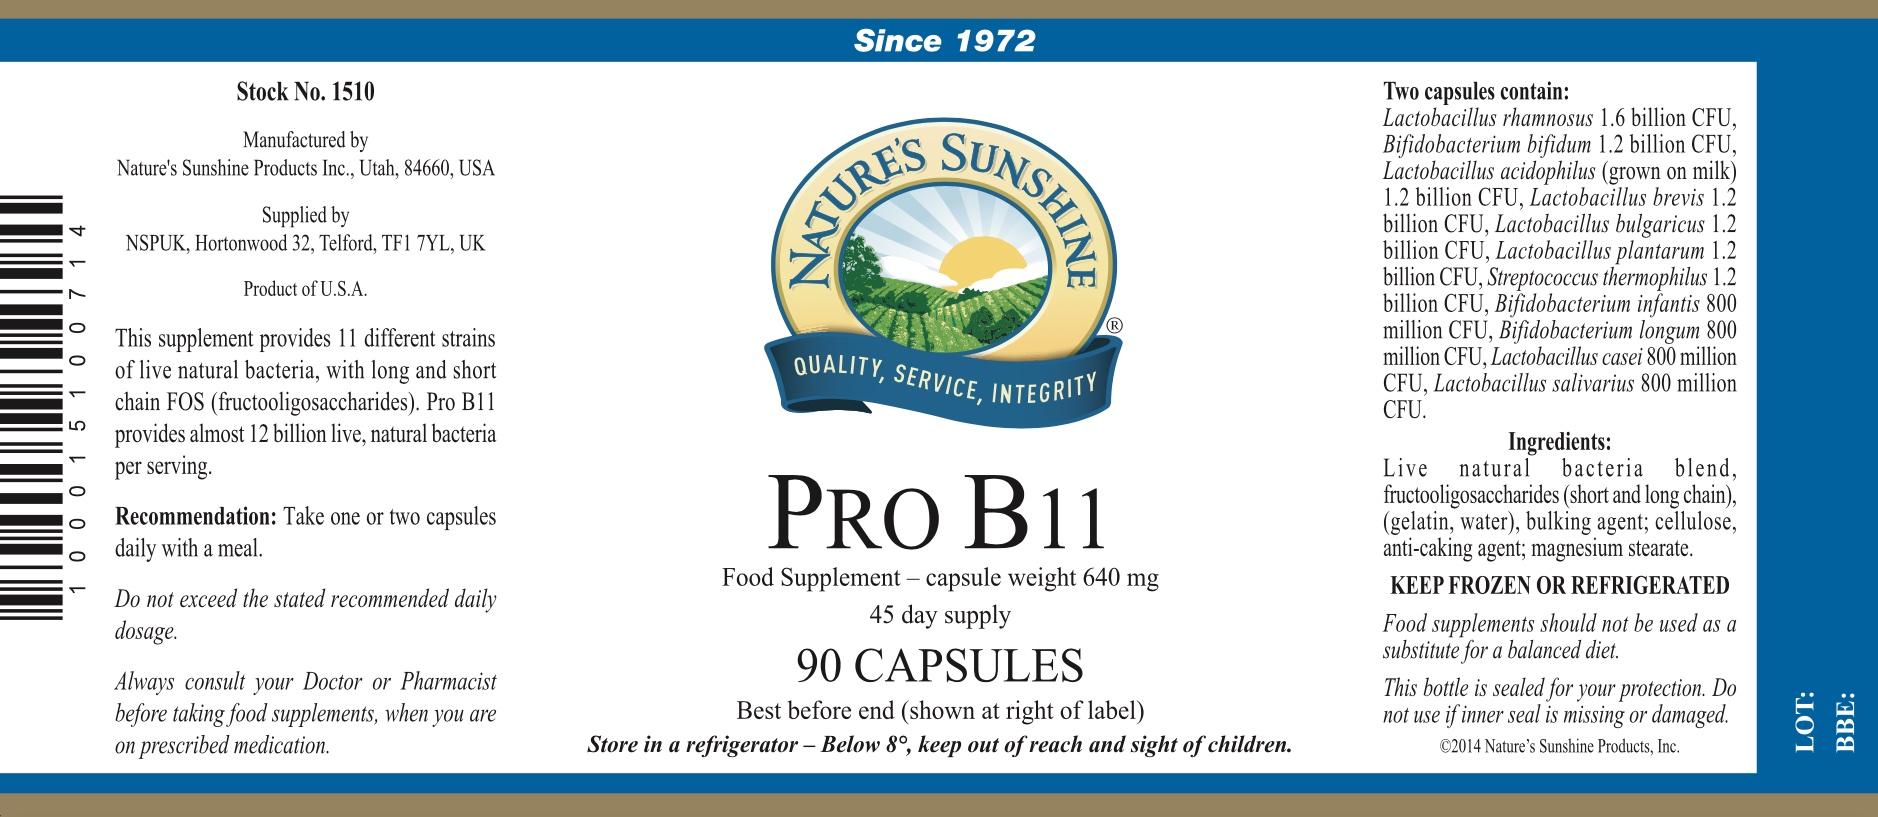 Nature's Sunshine Pro B11 - Label